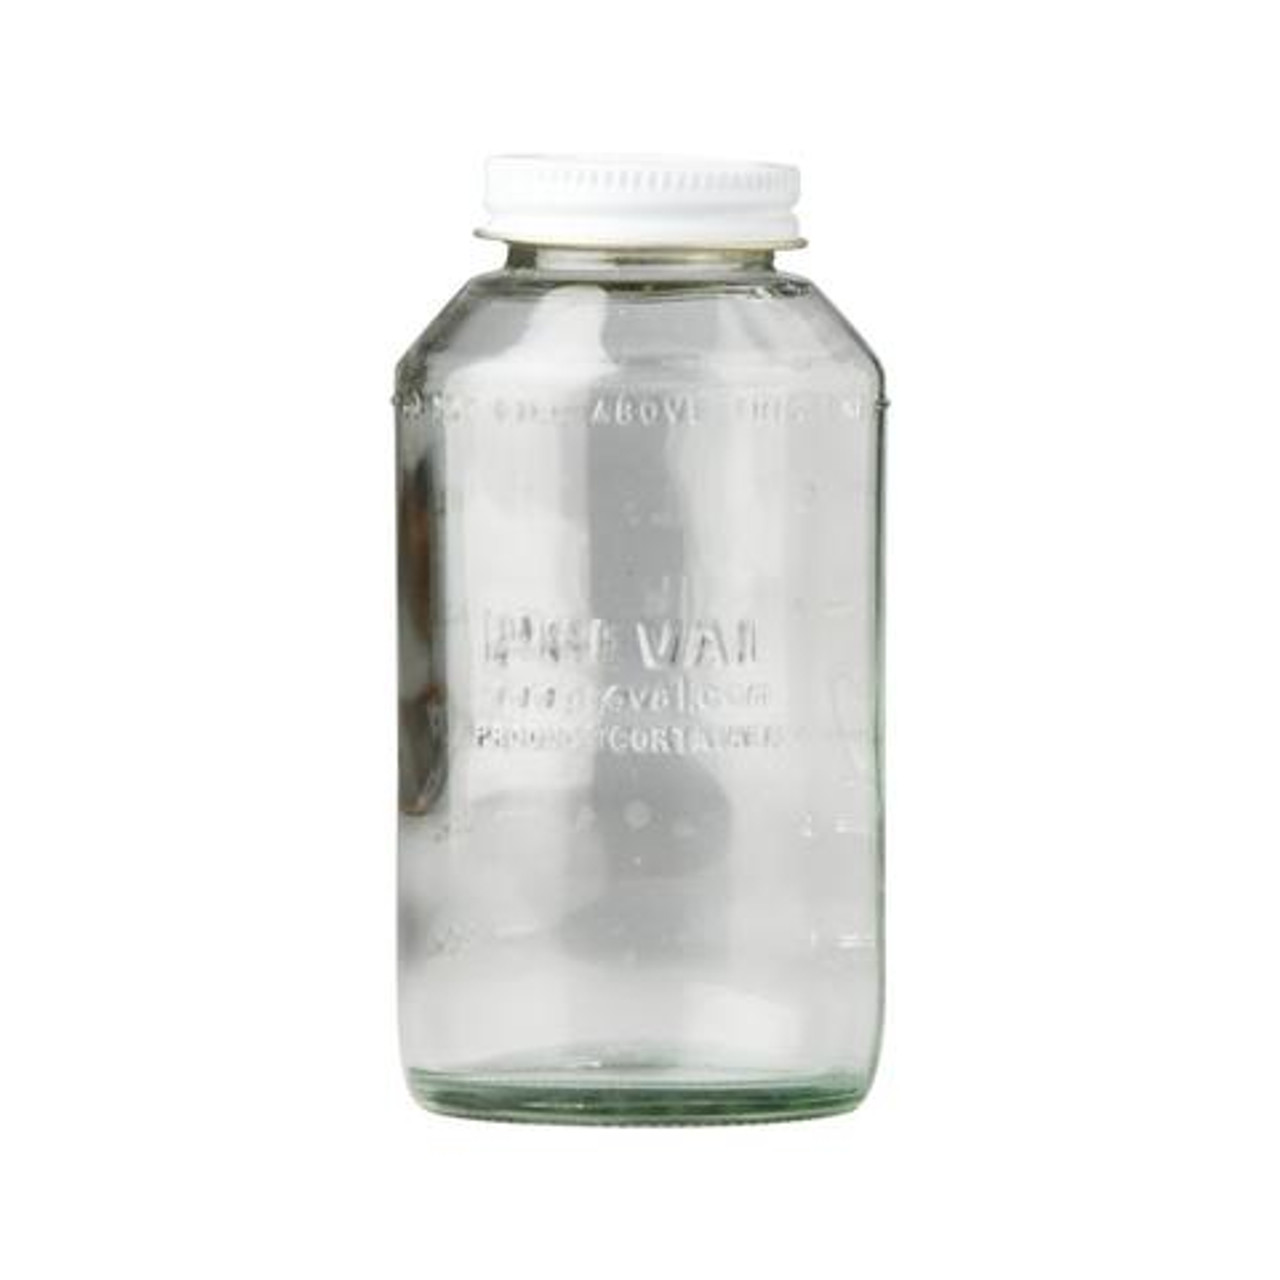 Preval Glass Jar